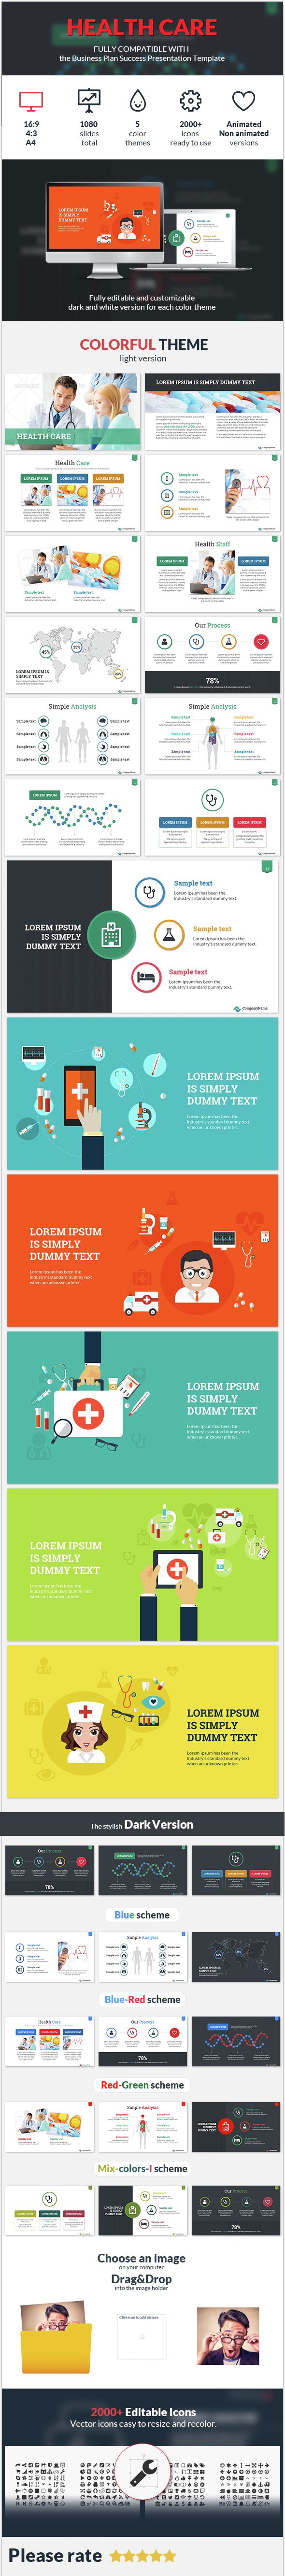 Business Insurance Sample Marketing Plan  Situation Analysis